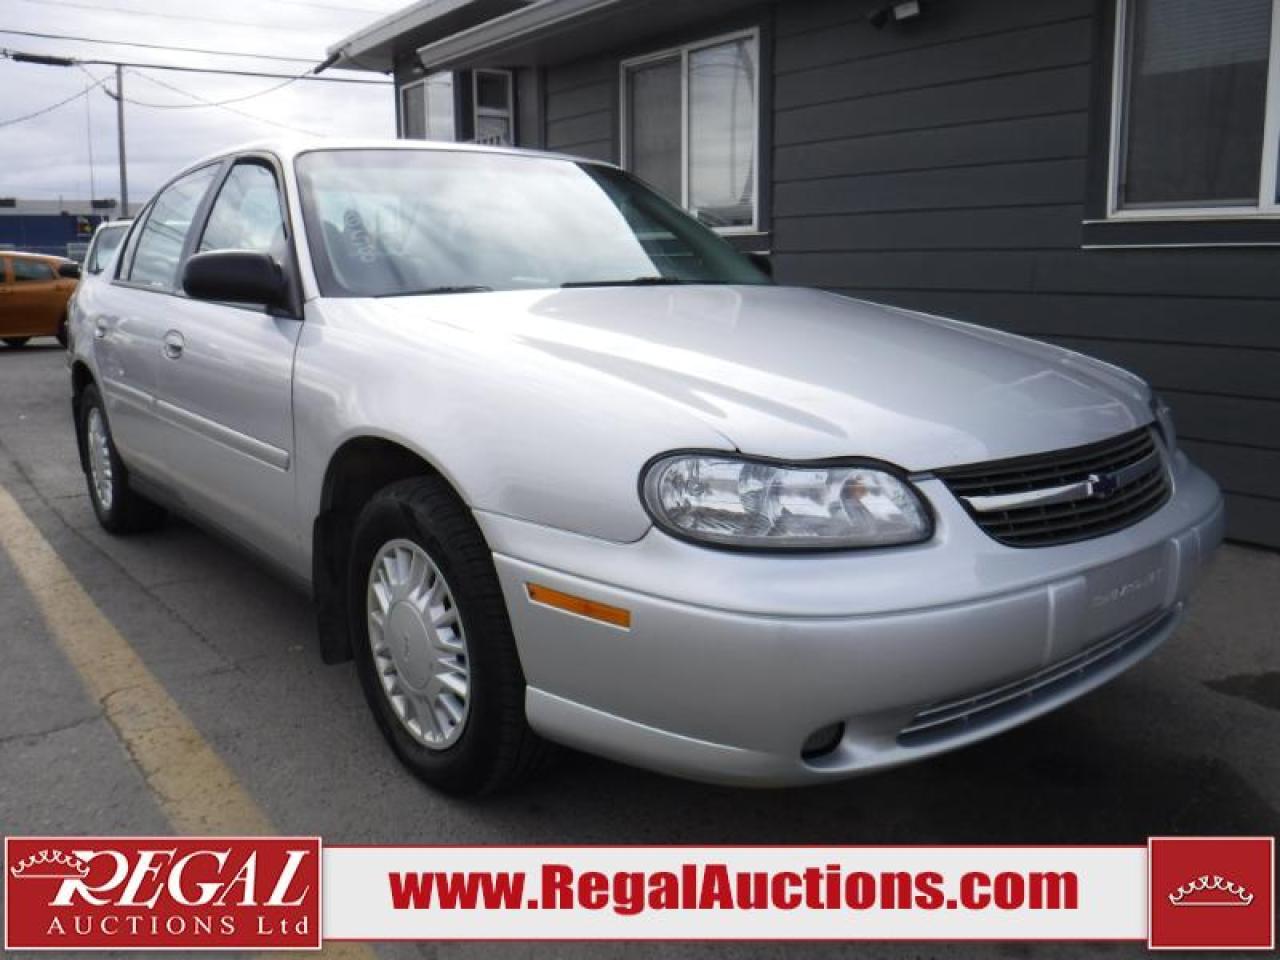 Photo of Silver 2001 Chevrolet Malibu